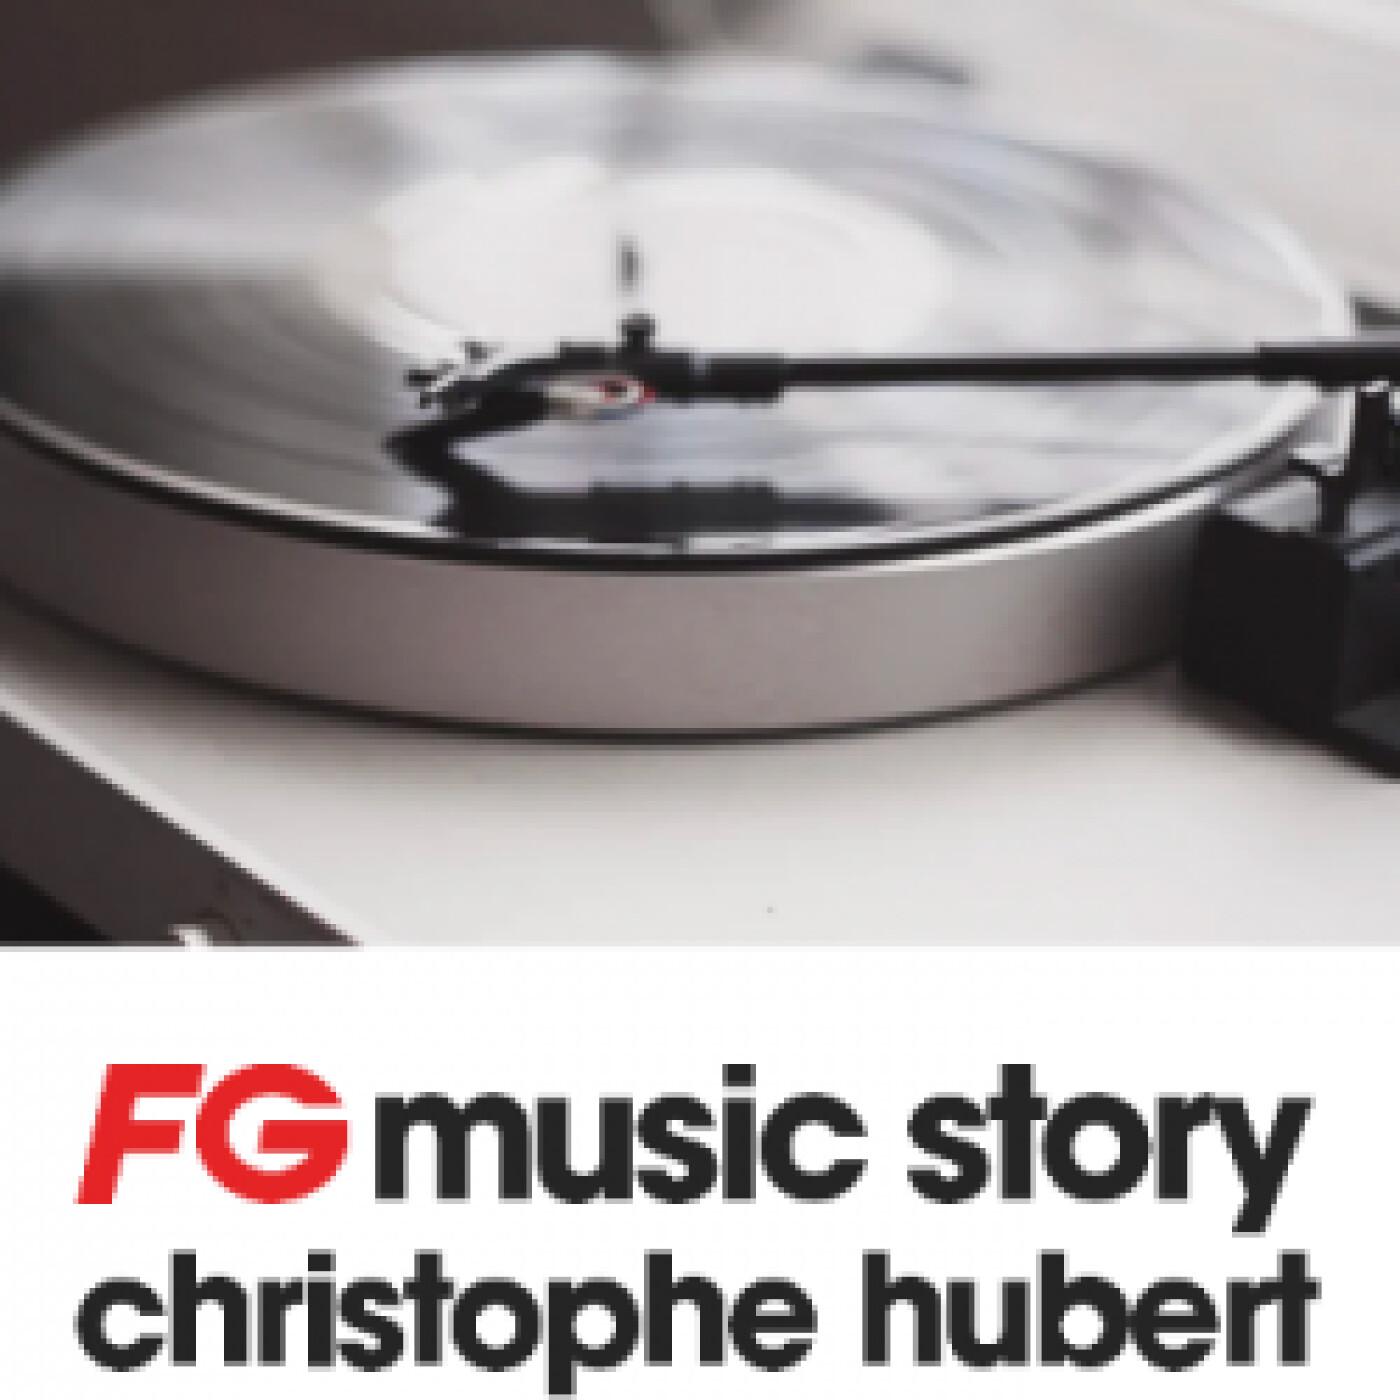 FG MUSIC STORY : FOLAMOUR